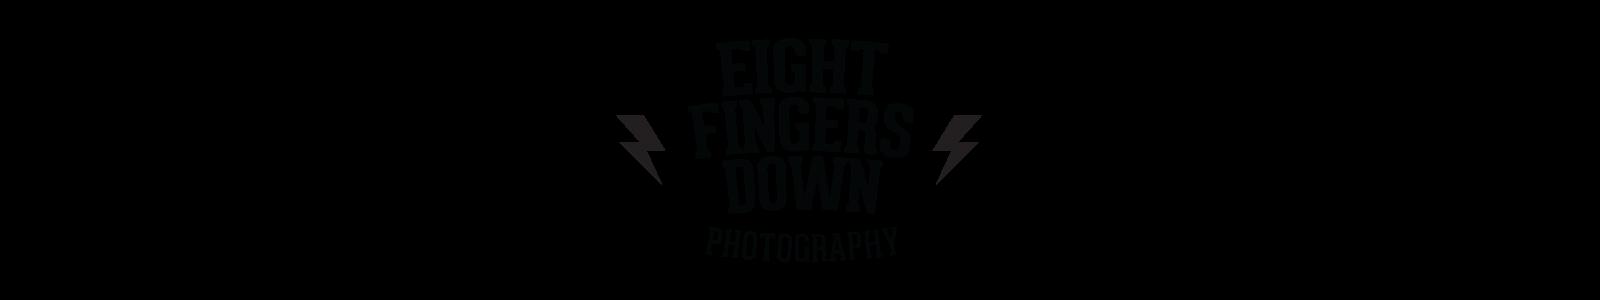 Eight Fingers Down: Photography by Matthias Schreyer